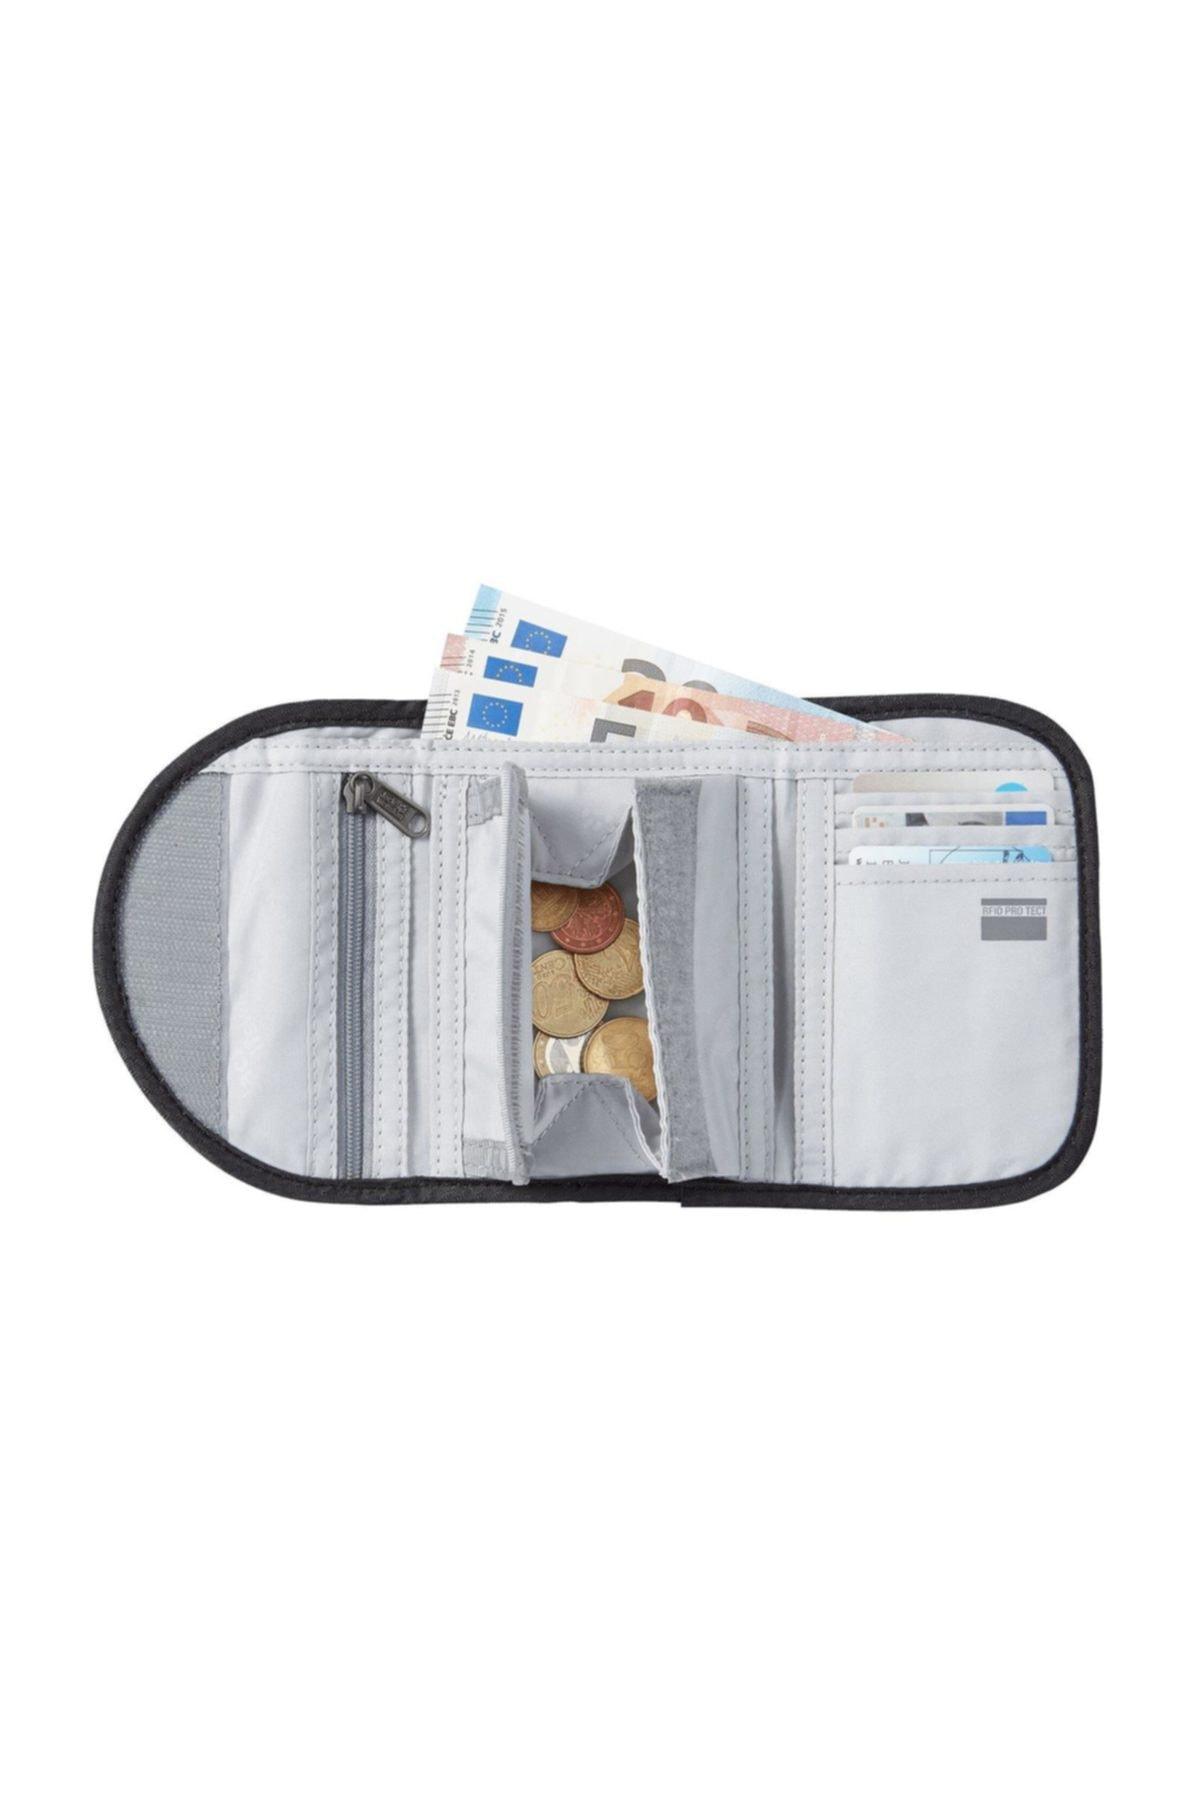 Jack Wolfskin Unisex Cashbag Cüzdan - 8006561-6350 2